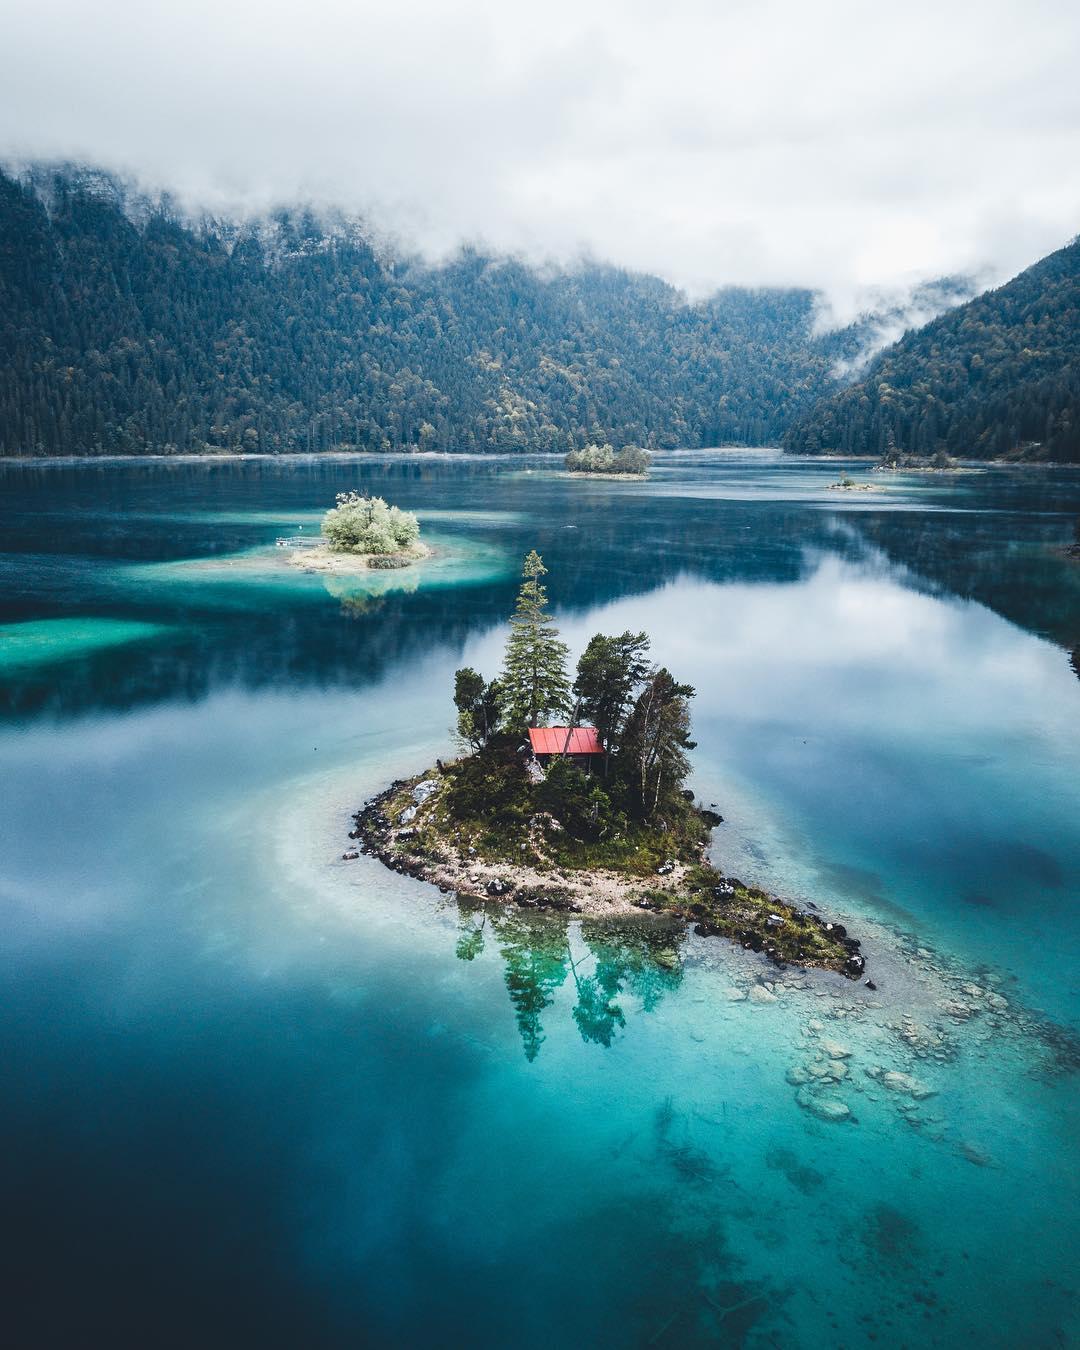 Природа и путешествия на снимках Ханнеса Стиера